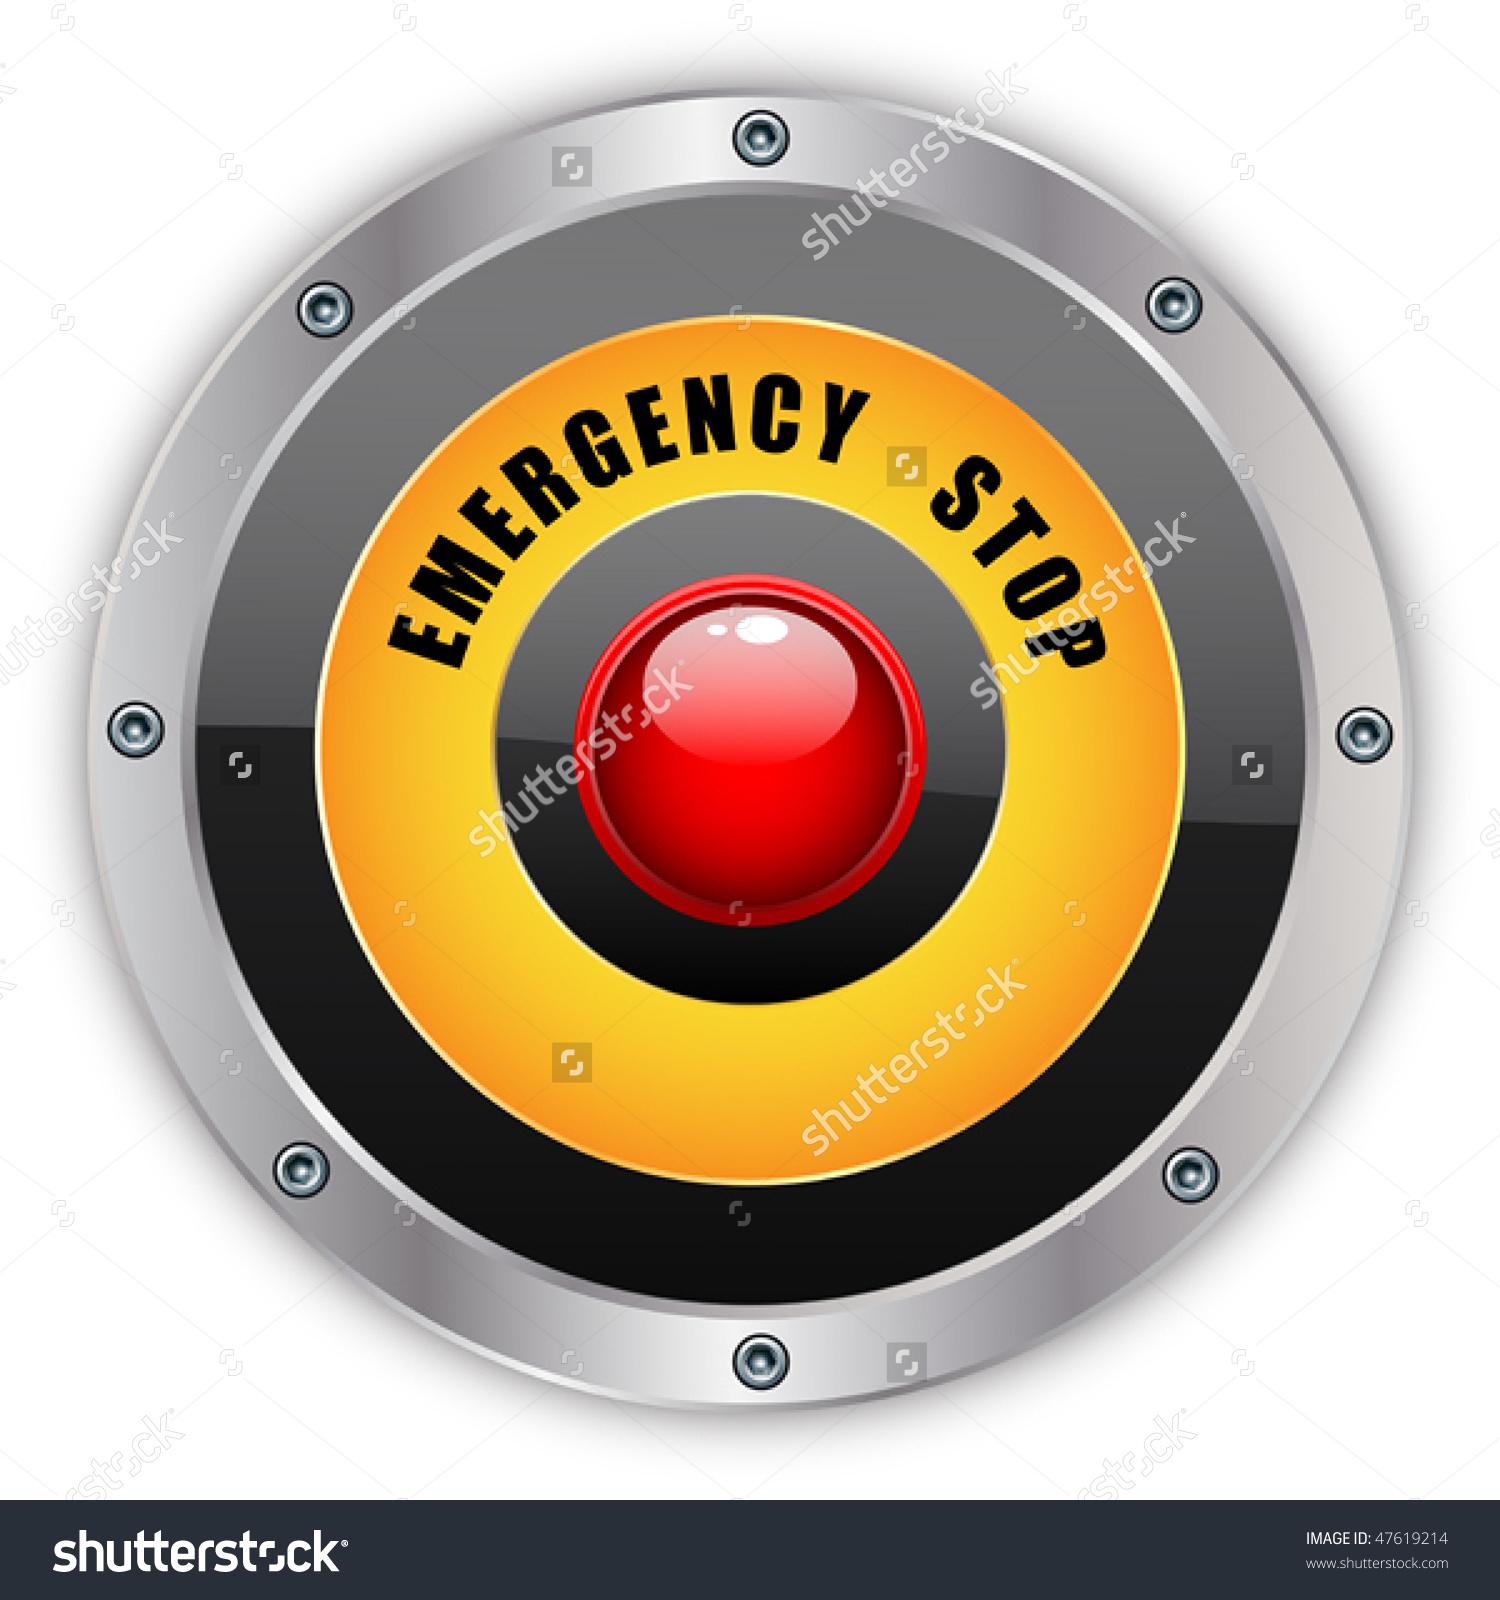 Emergency Stop Button Eps 10 Stock Vector 47619214.